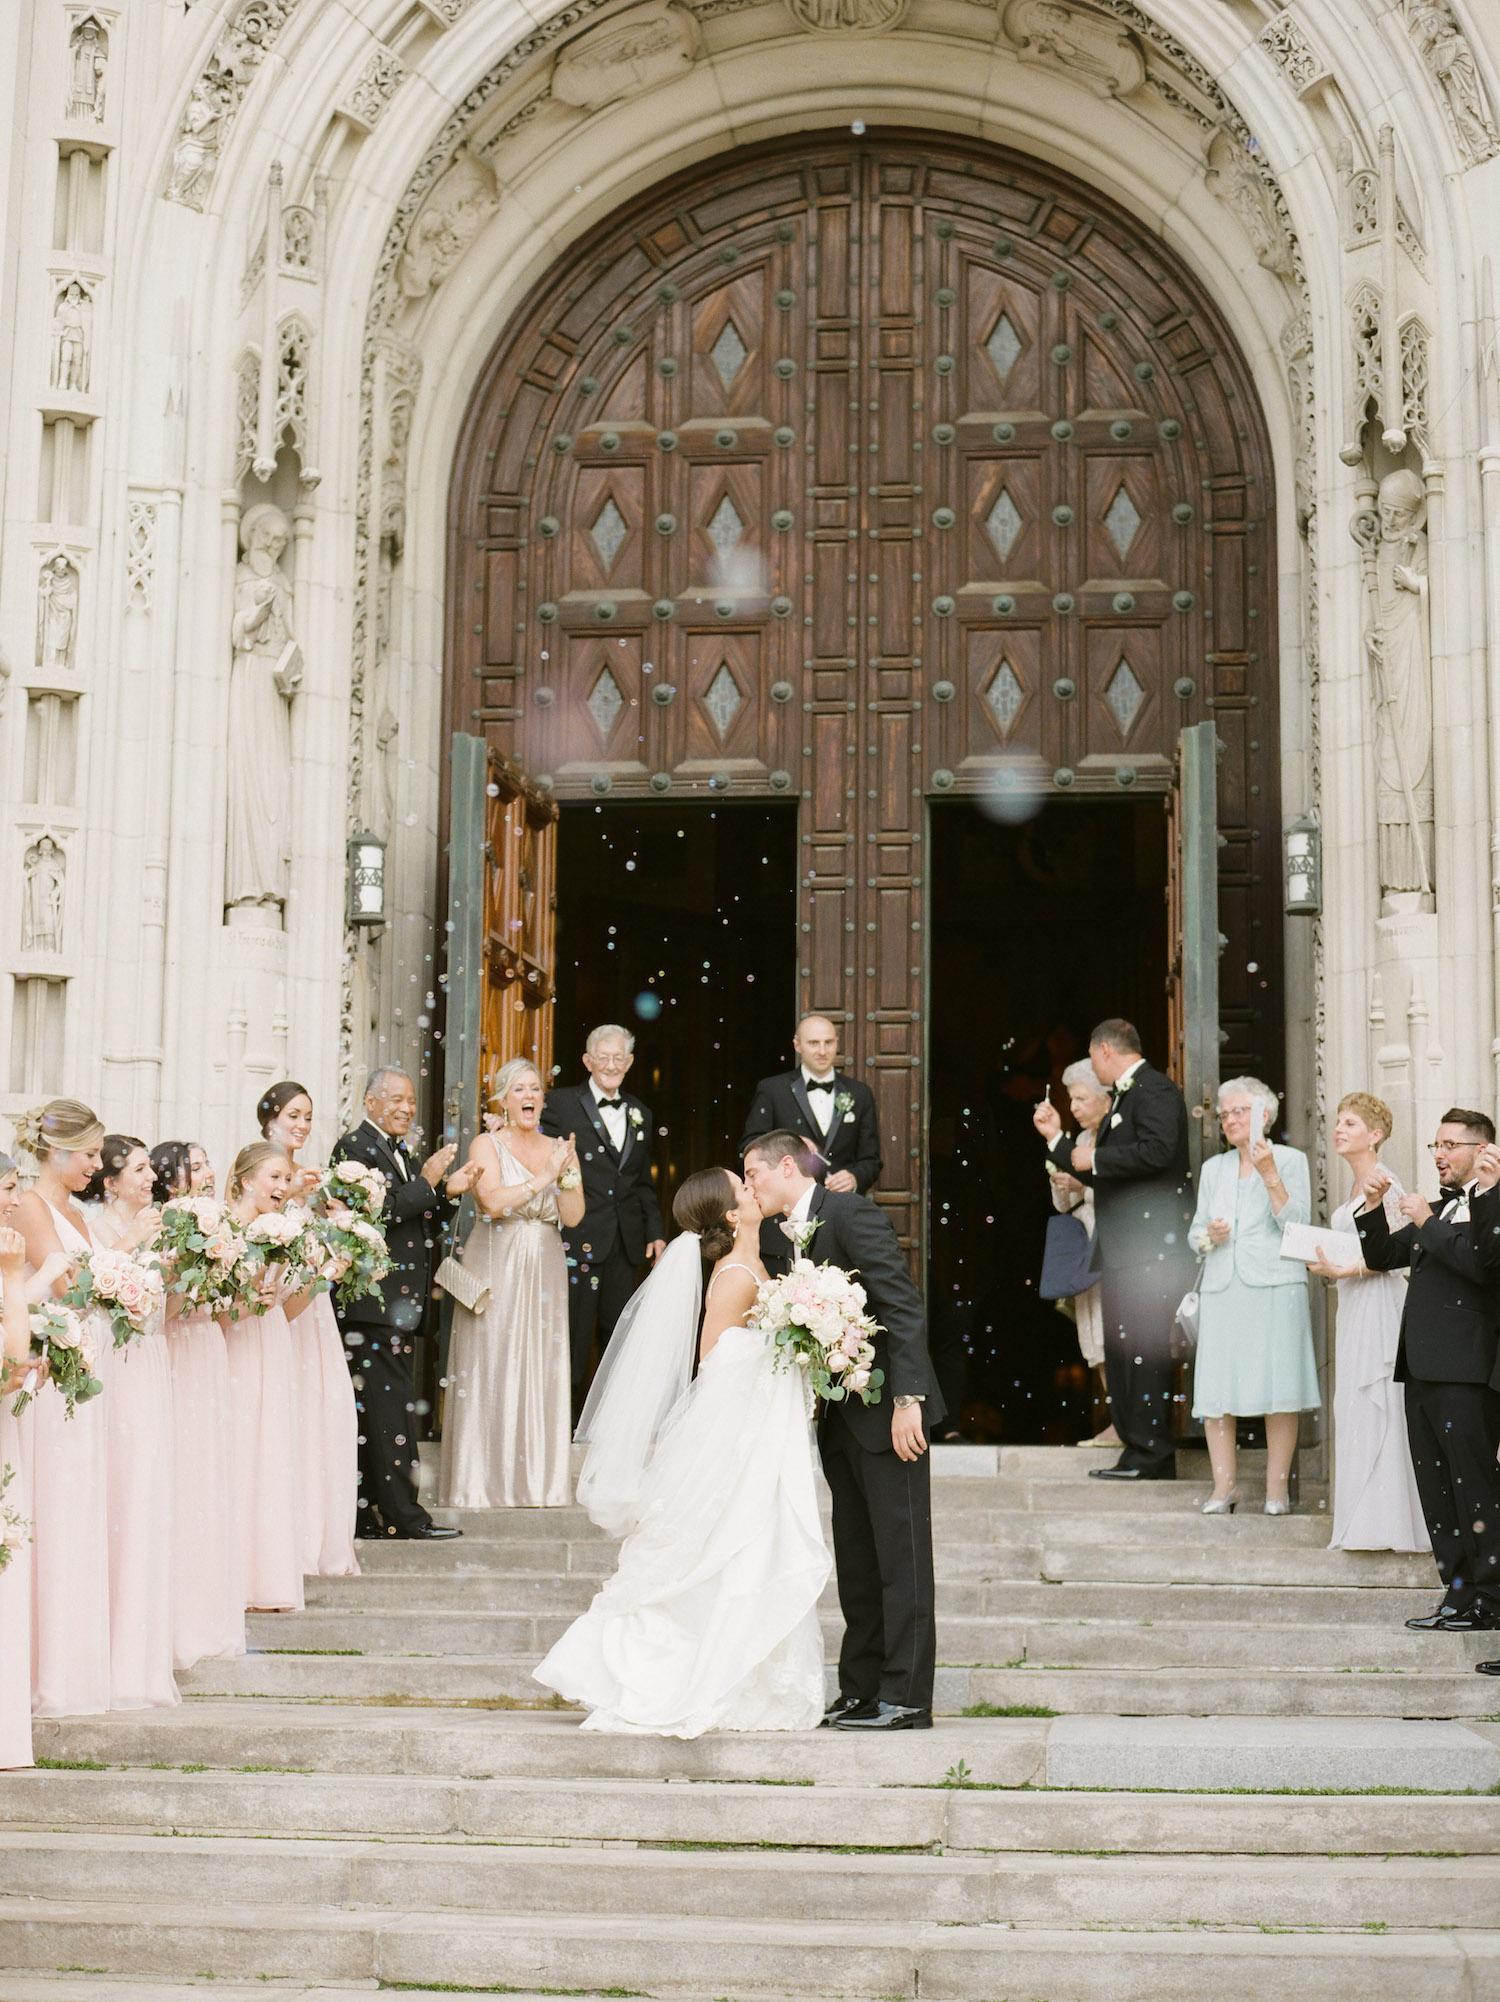 Toledo-Renaissance-Wedding-105814030007.jpg